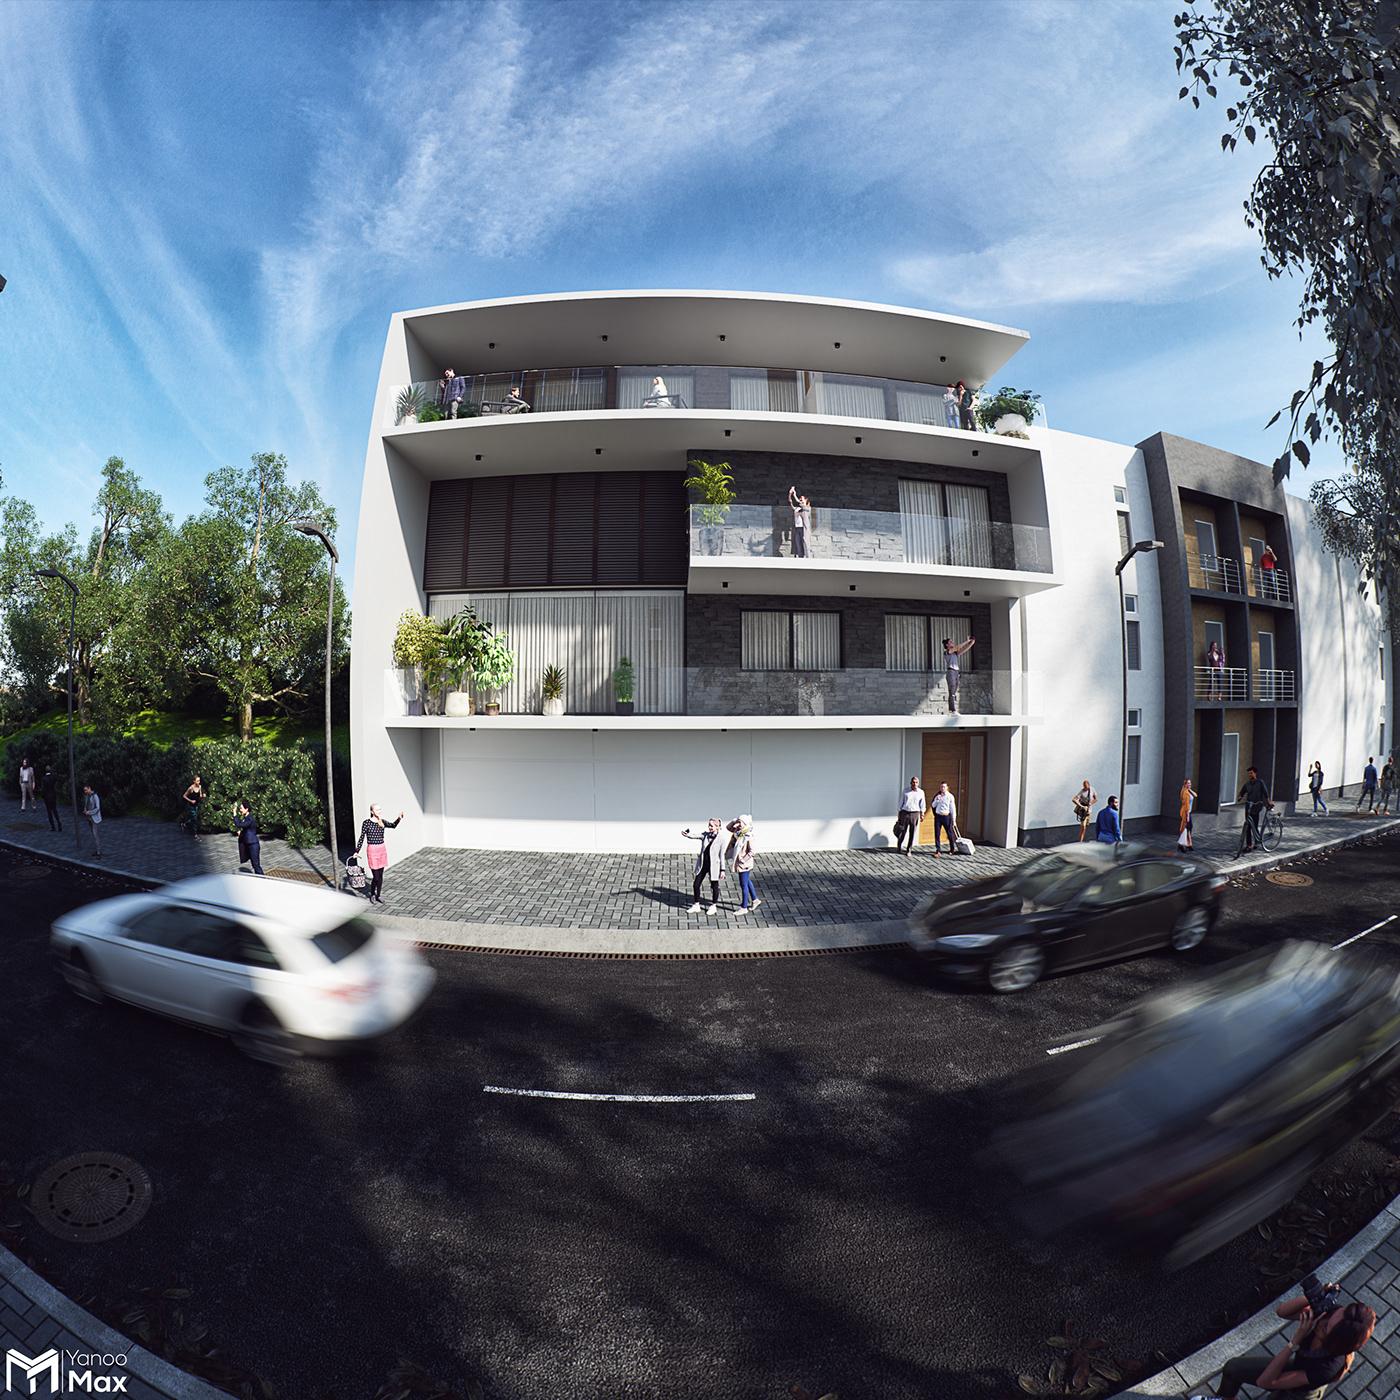 3D 3ds max architecture corona renderer exterior interior design  modeling Render visualization vray